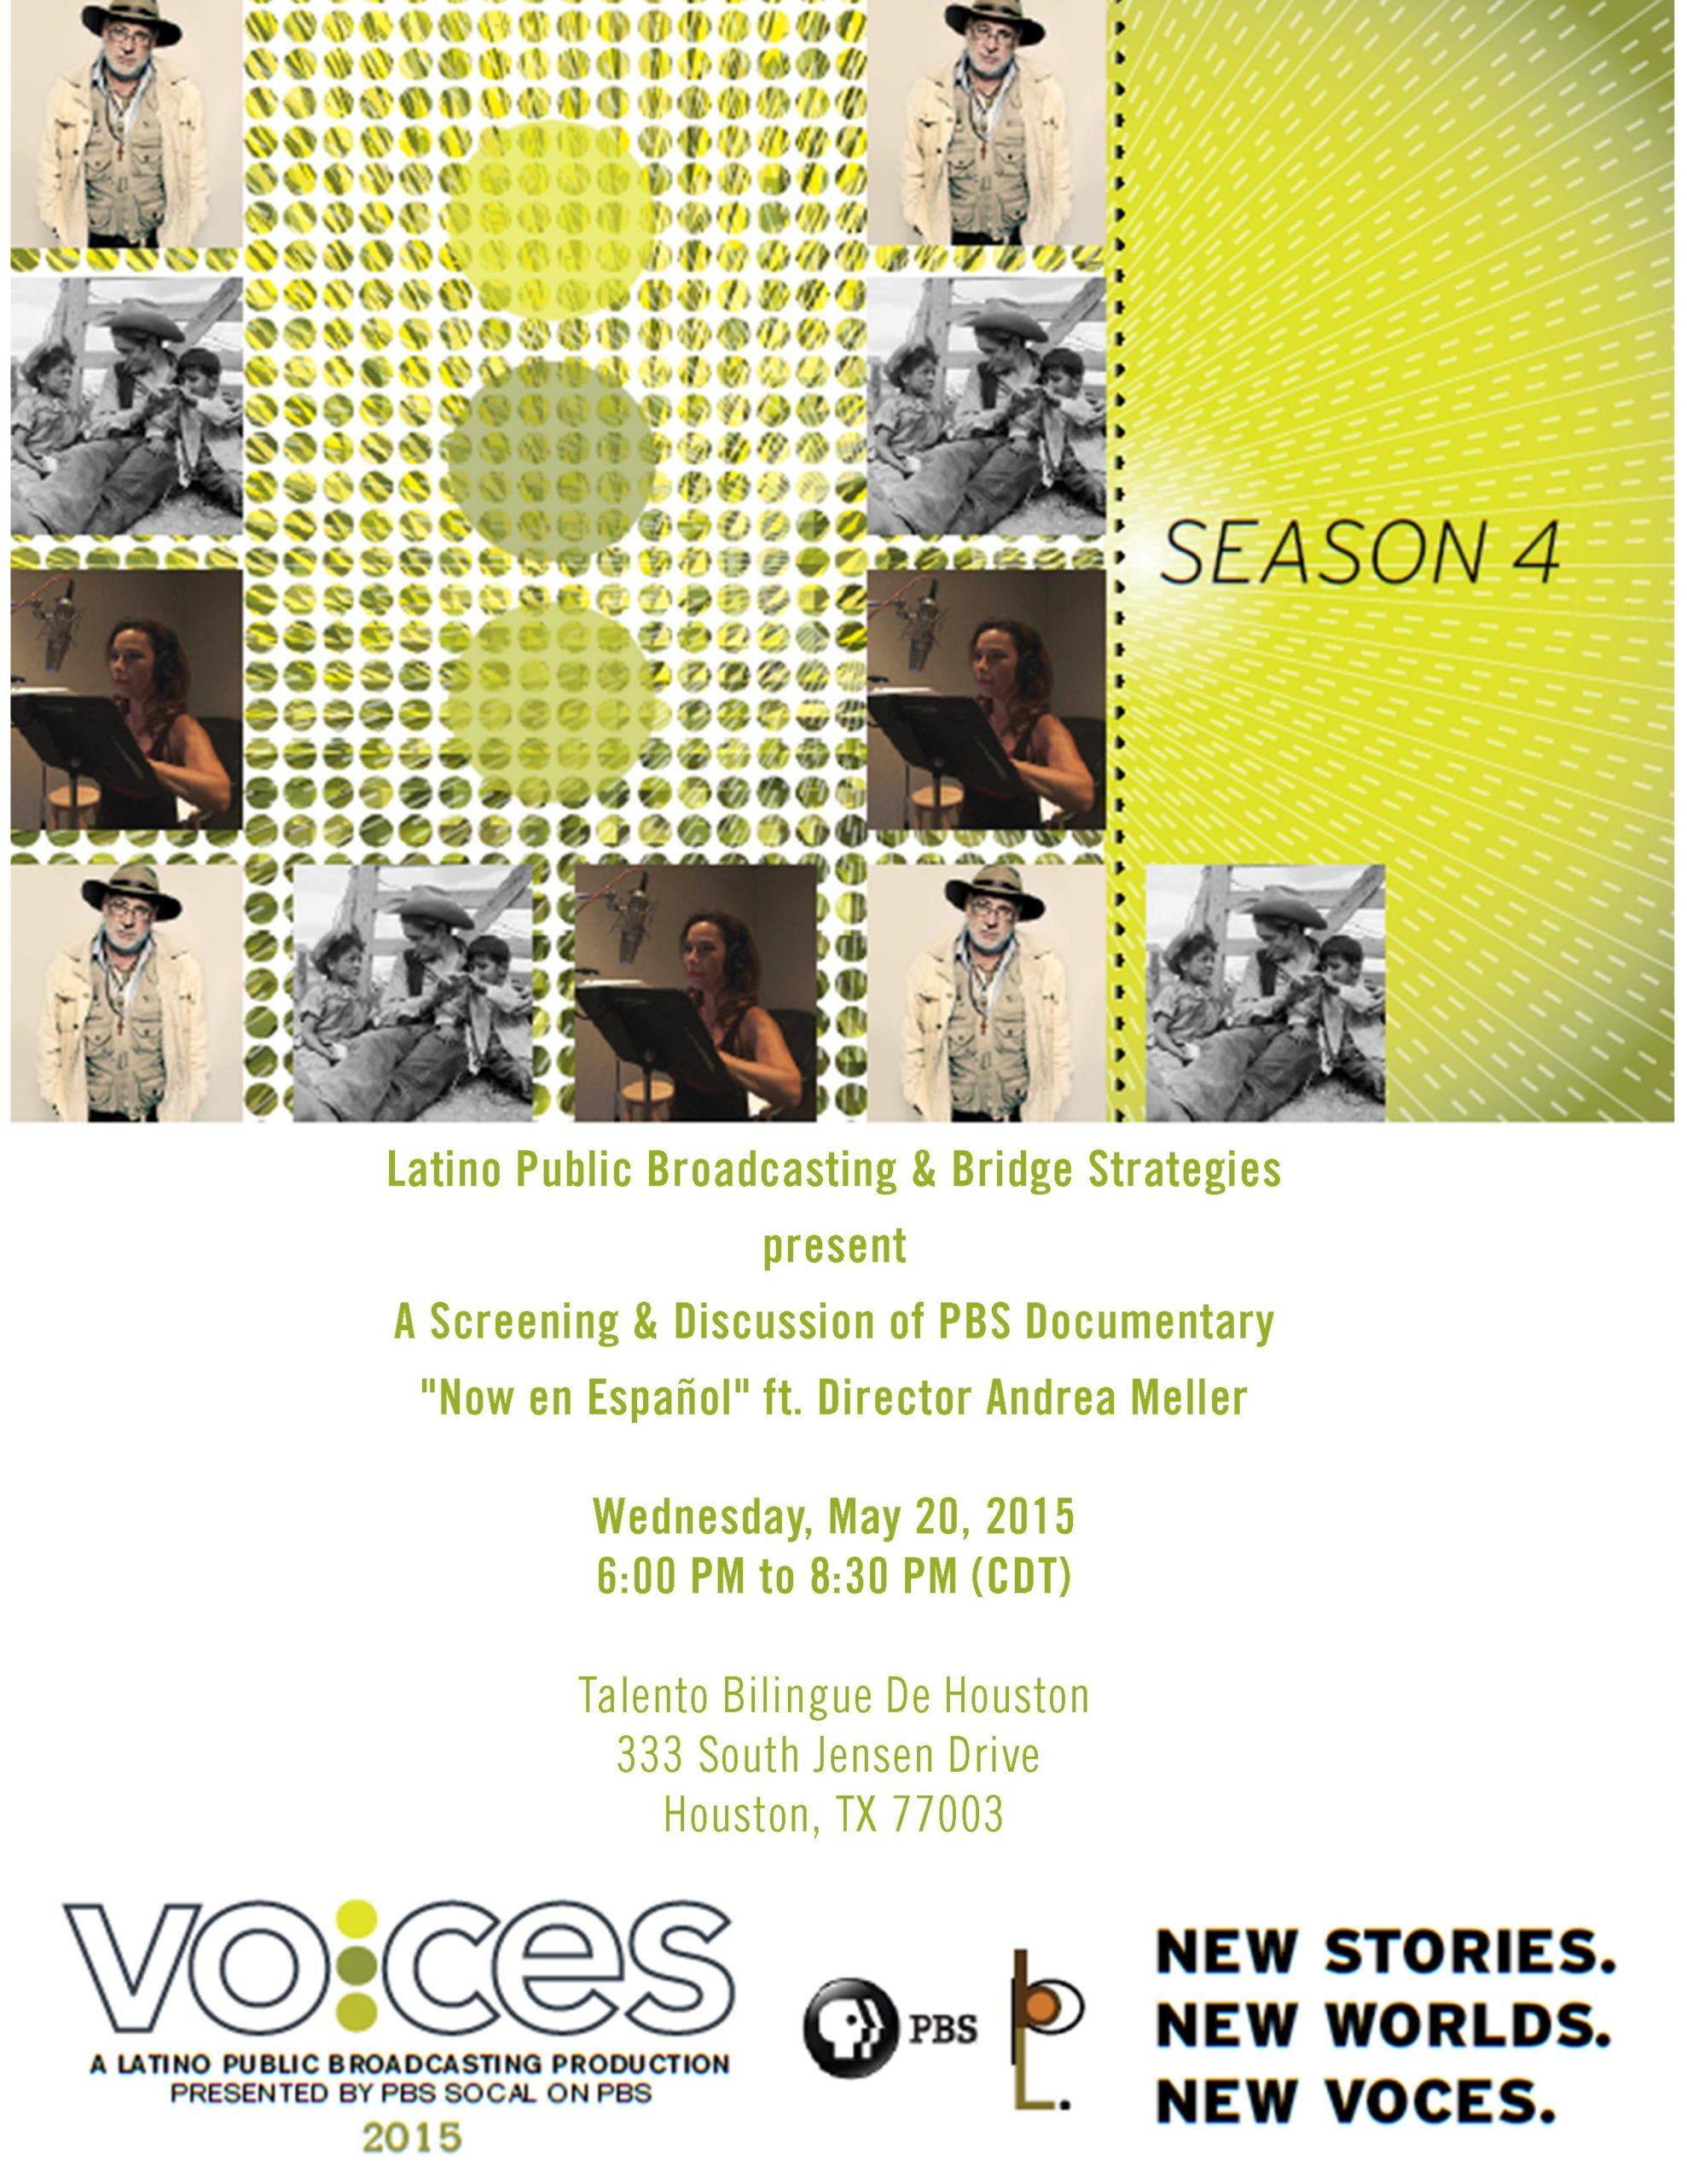 "Screening of PBS Documentary ""Now en Español"" on Wednesday, May 20, 2015 (more info at www.hispanichouston.coim)"